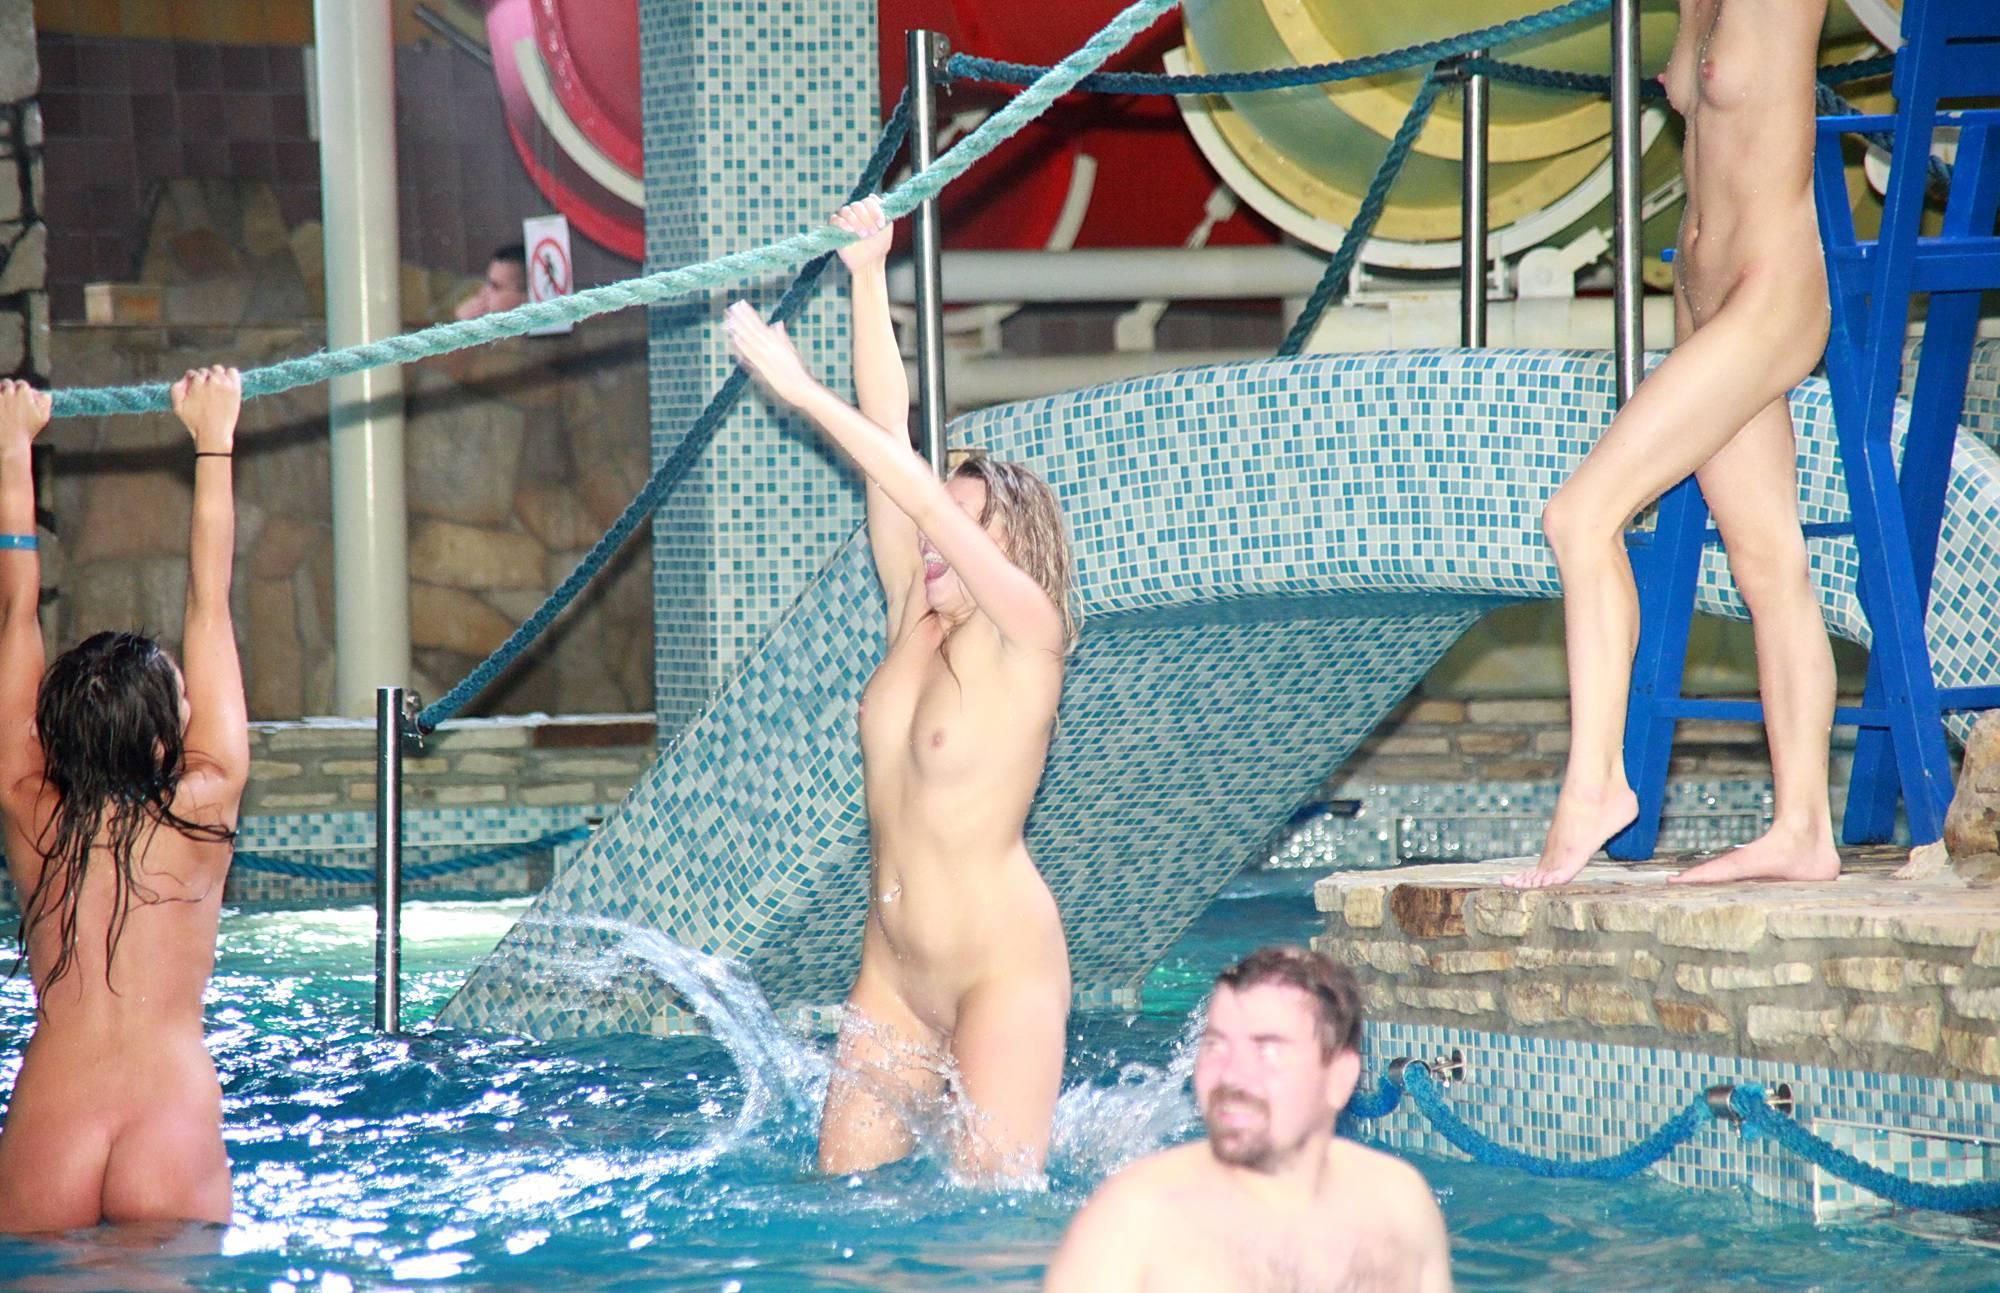 Pure Nudism Photos-Bright Swimming Area - 4